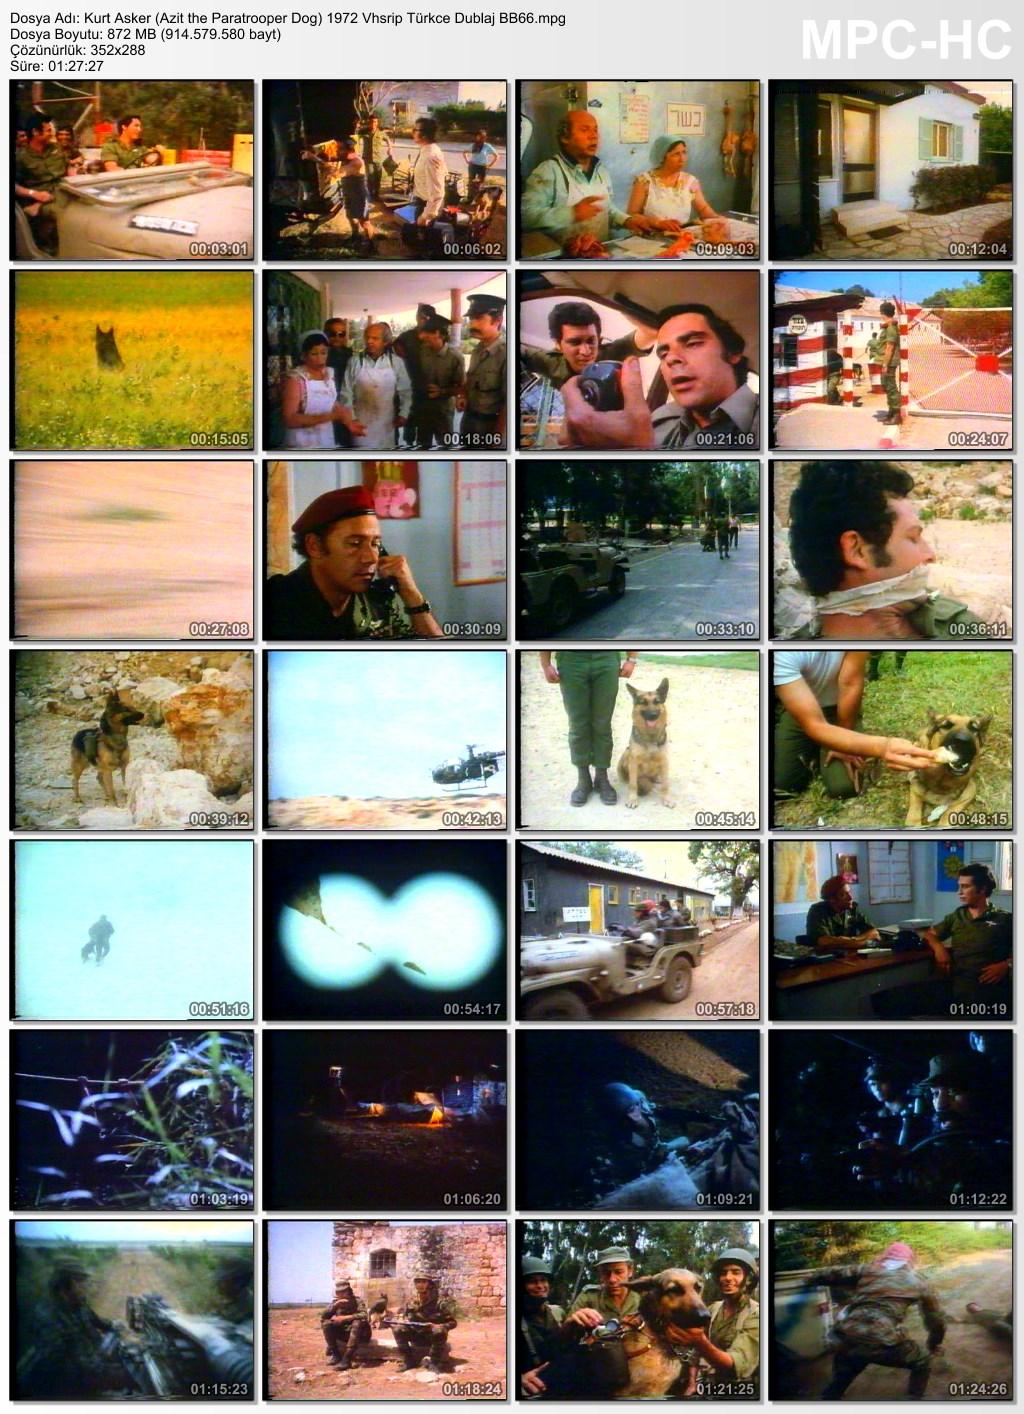 Kurt Asker (Azit the Paratrooper Dog) 1972 Vhsrip Türkce Dublaj BB66 - barbarus